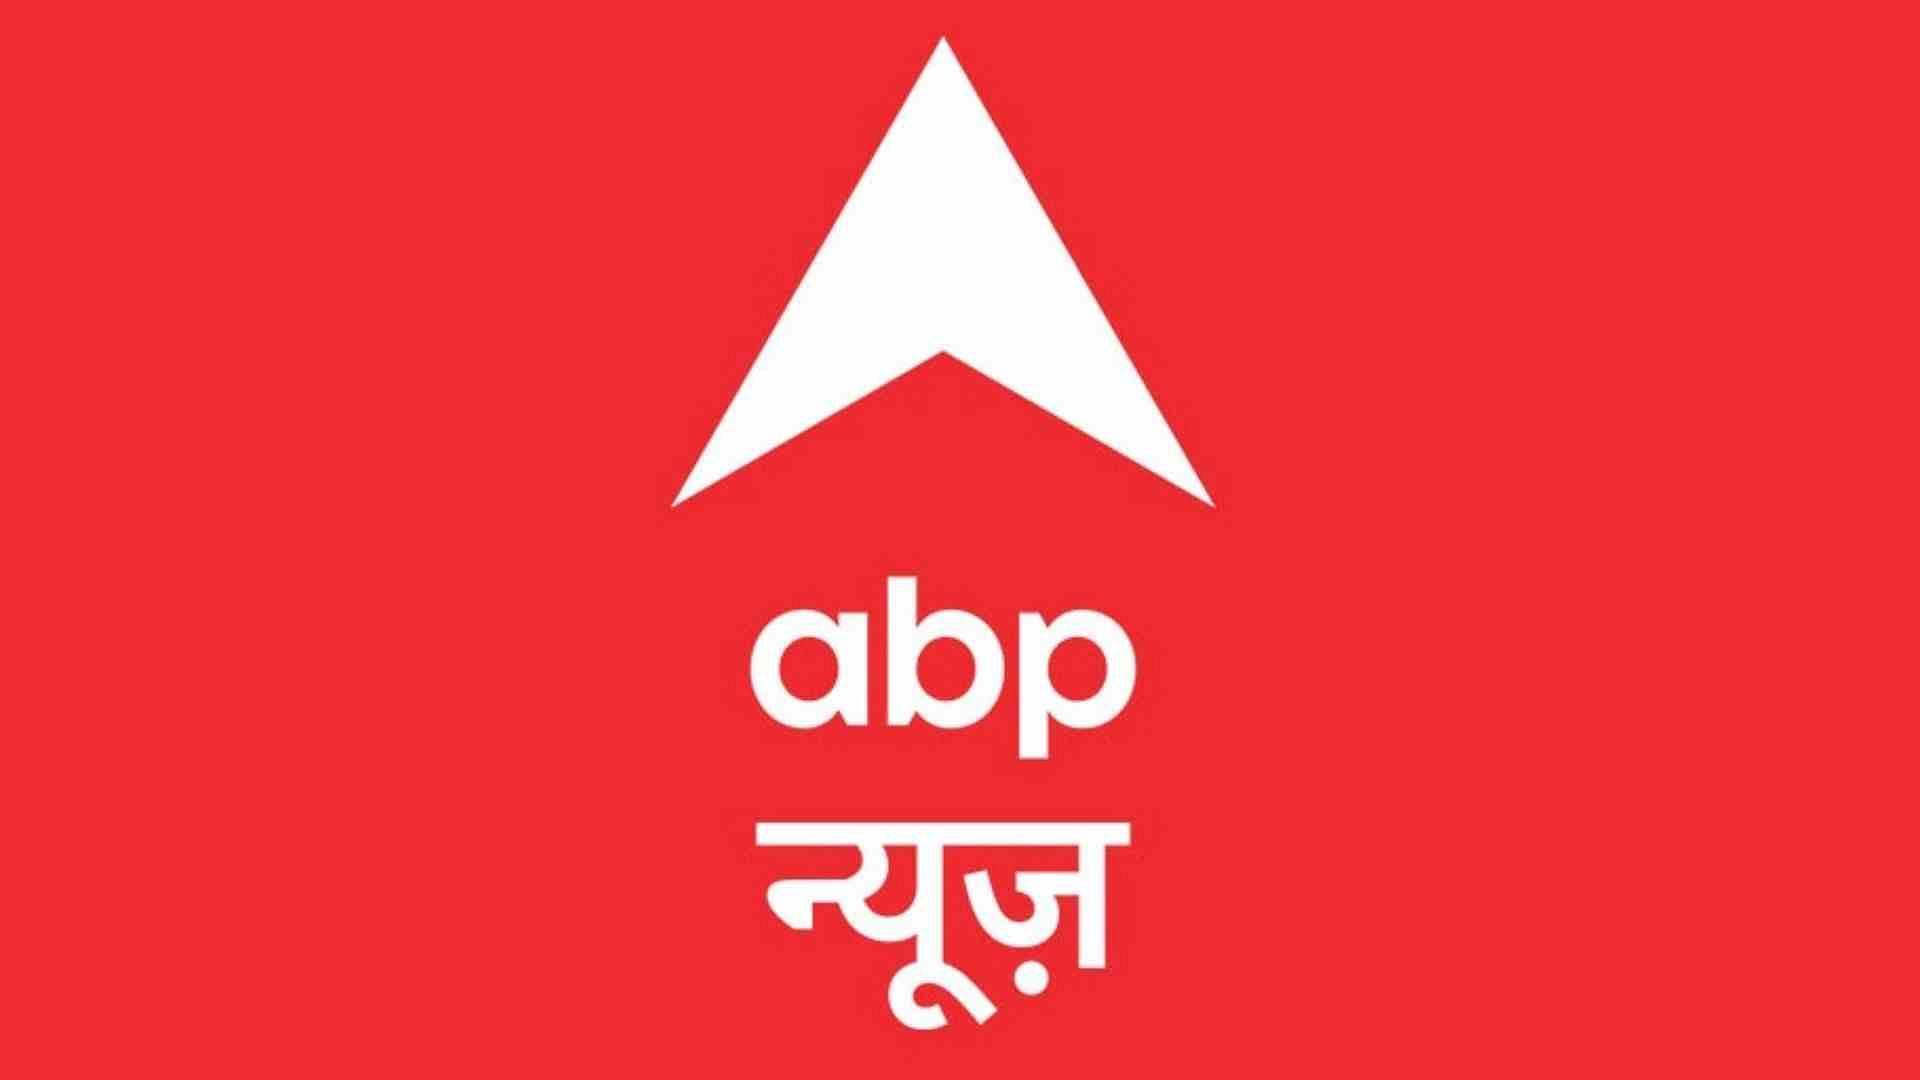 abp logo?blur=25